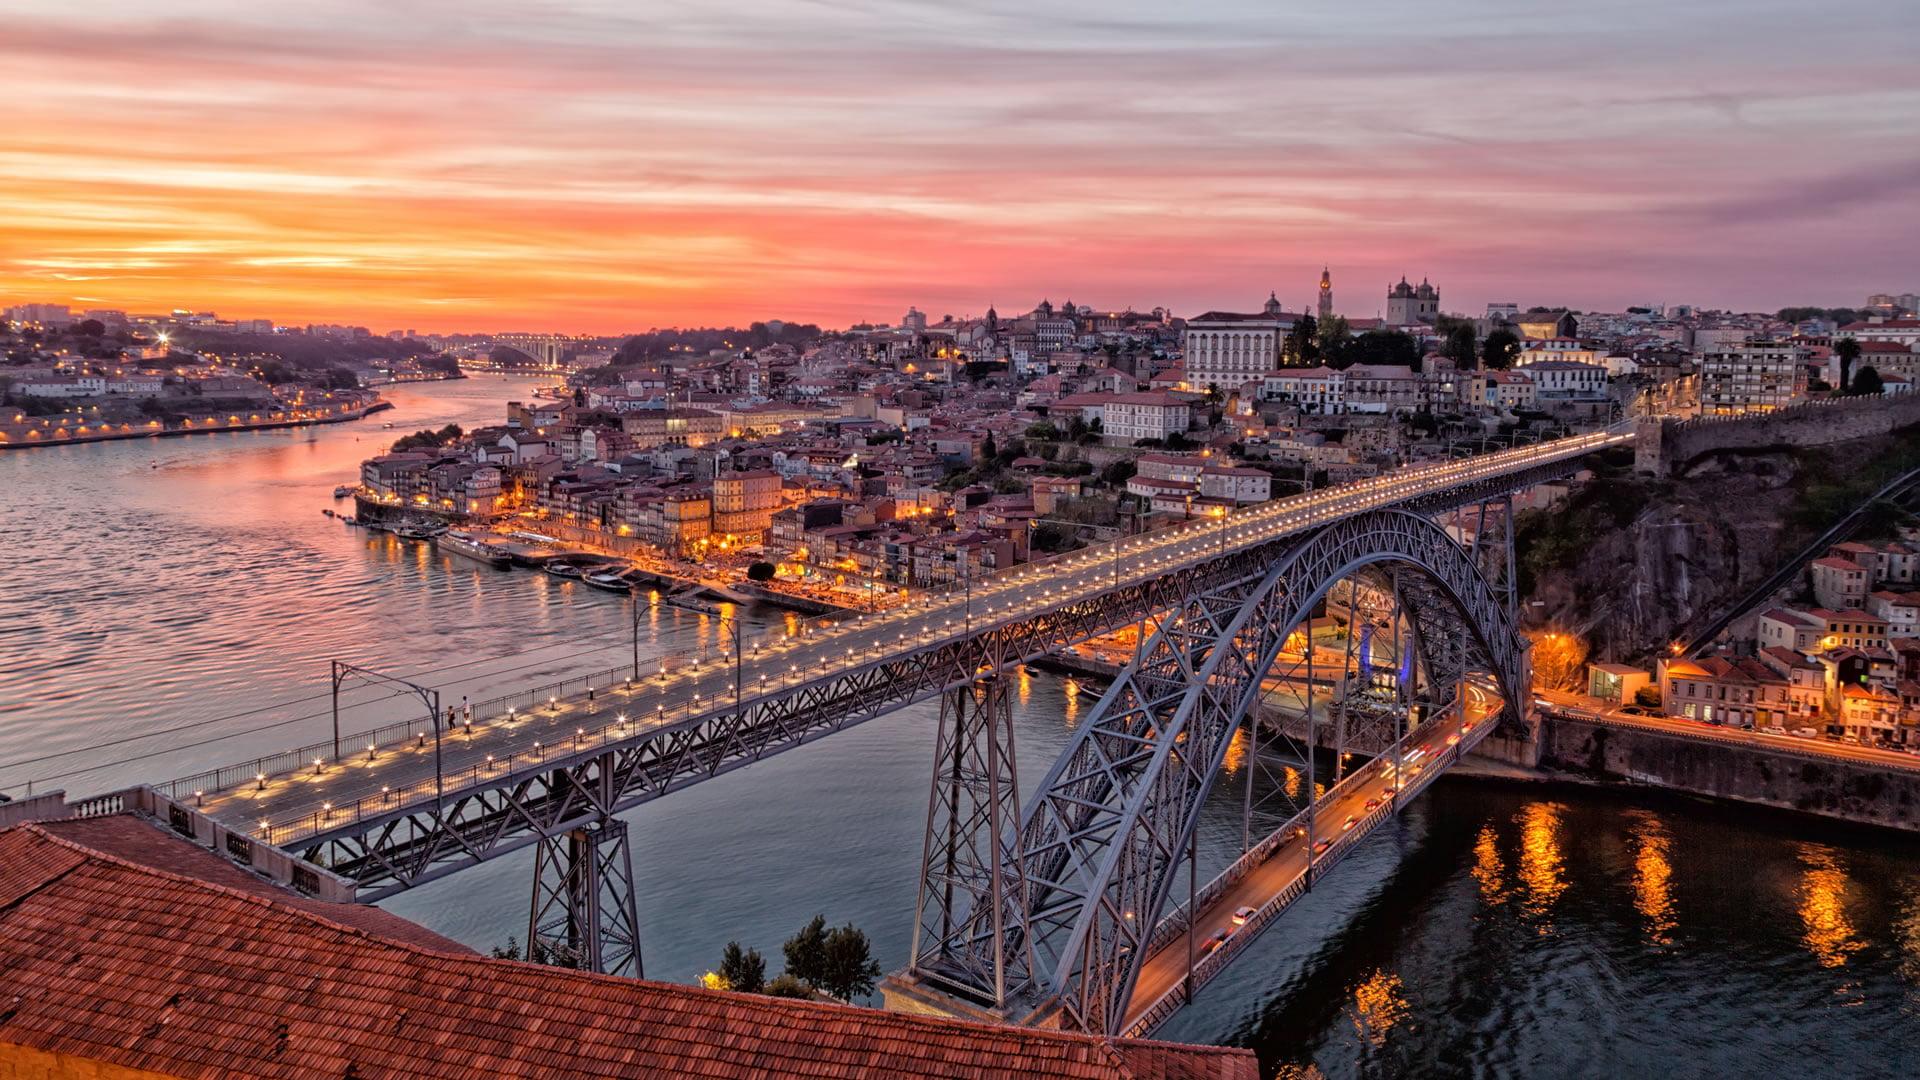 Paisajes Wallpapers Full Hd Puente De Luis I Oporto Portugal